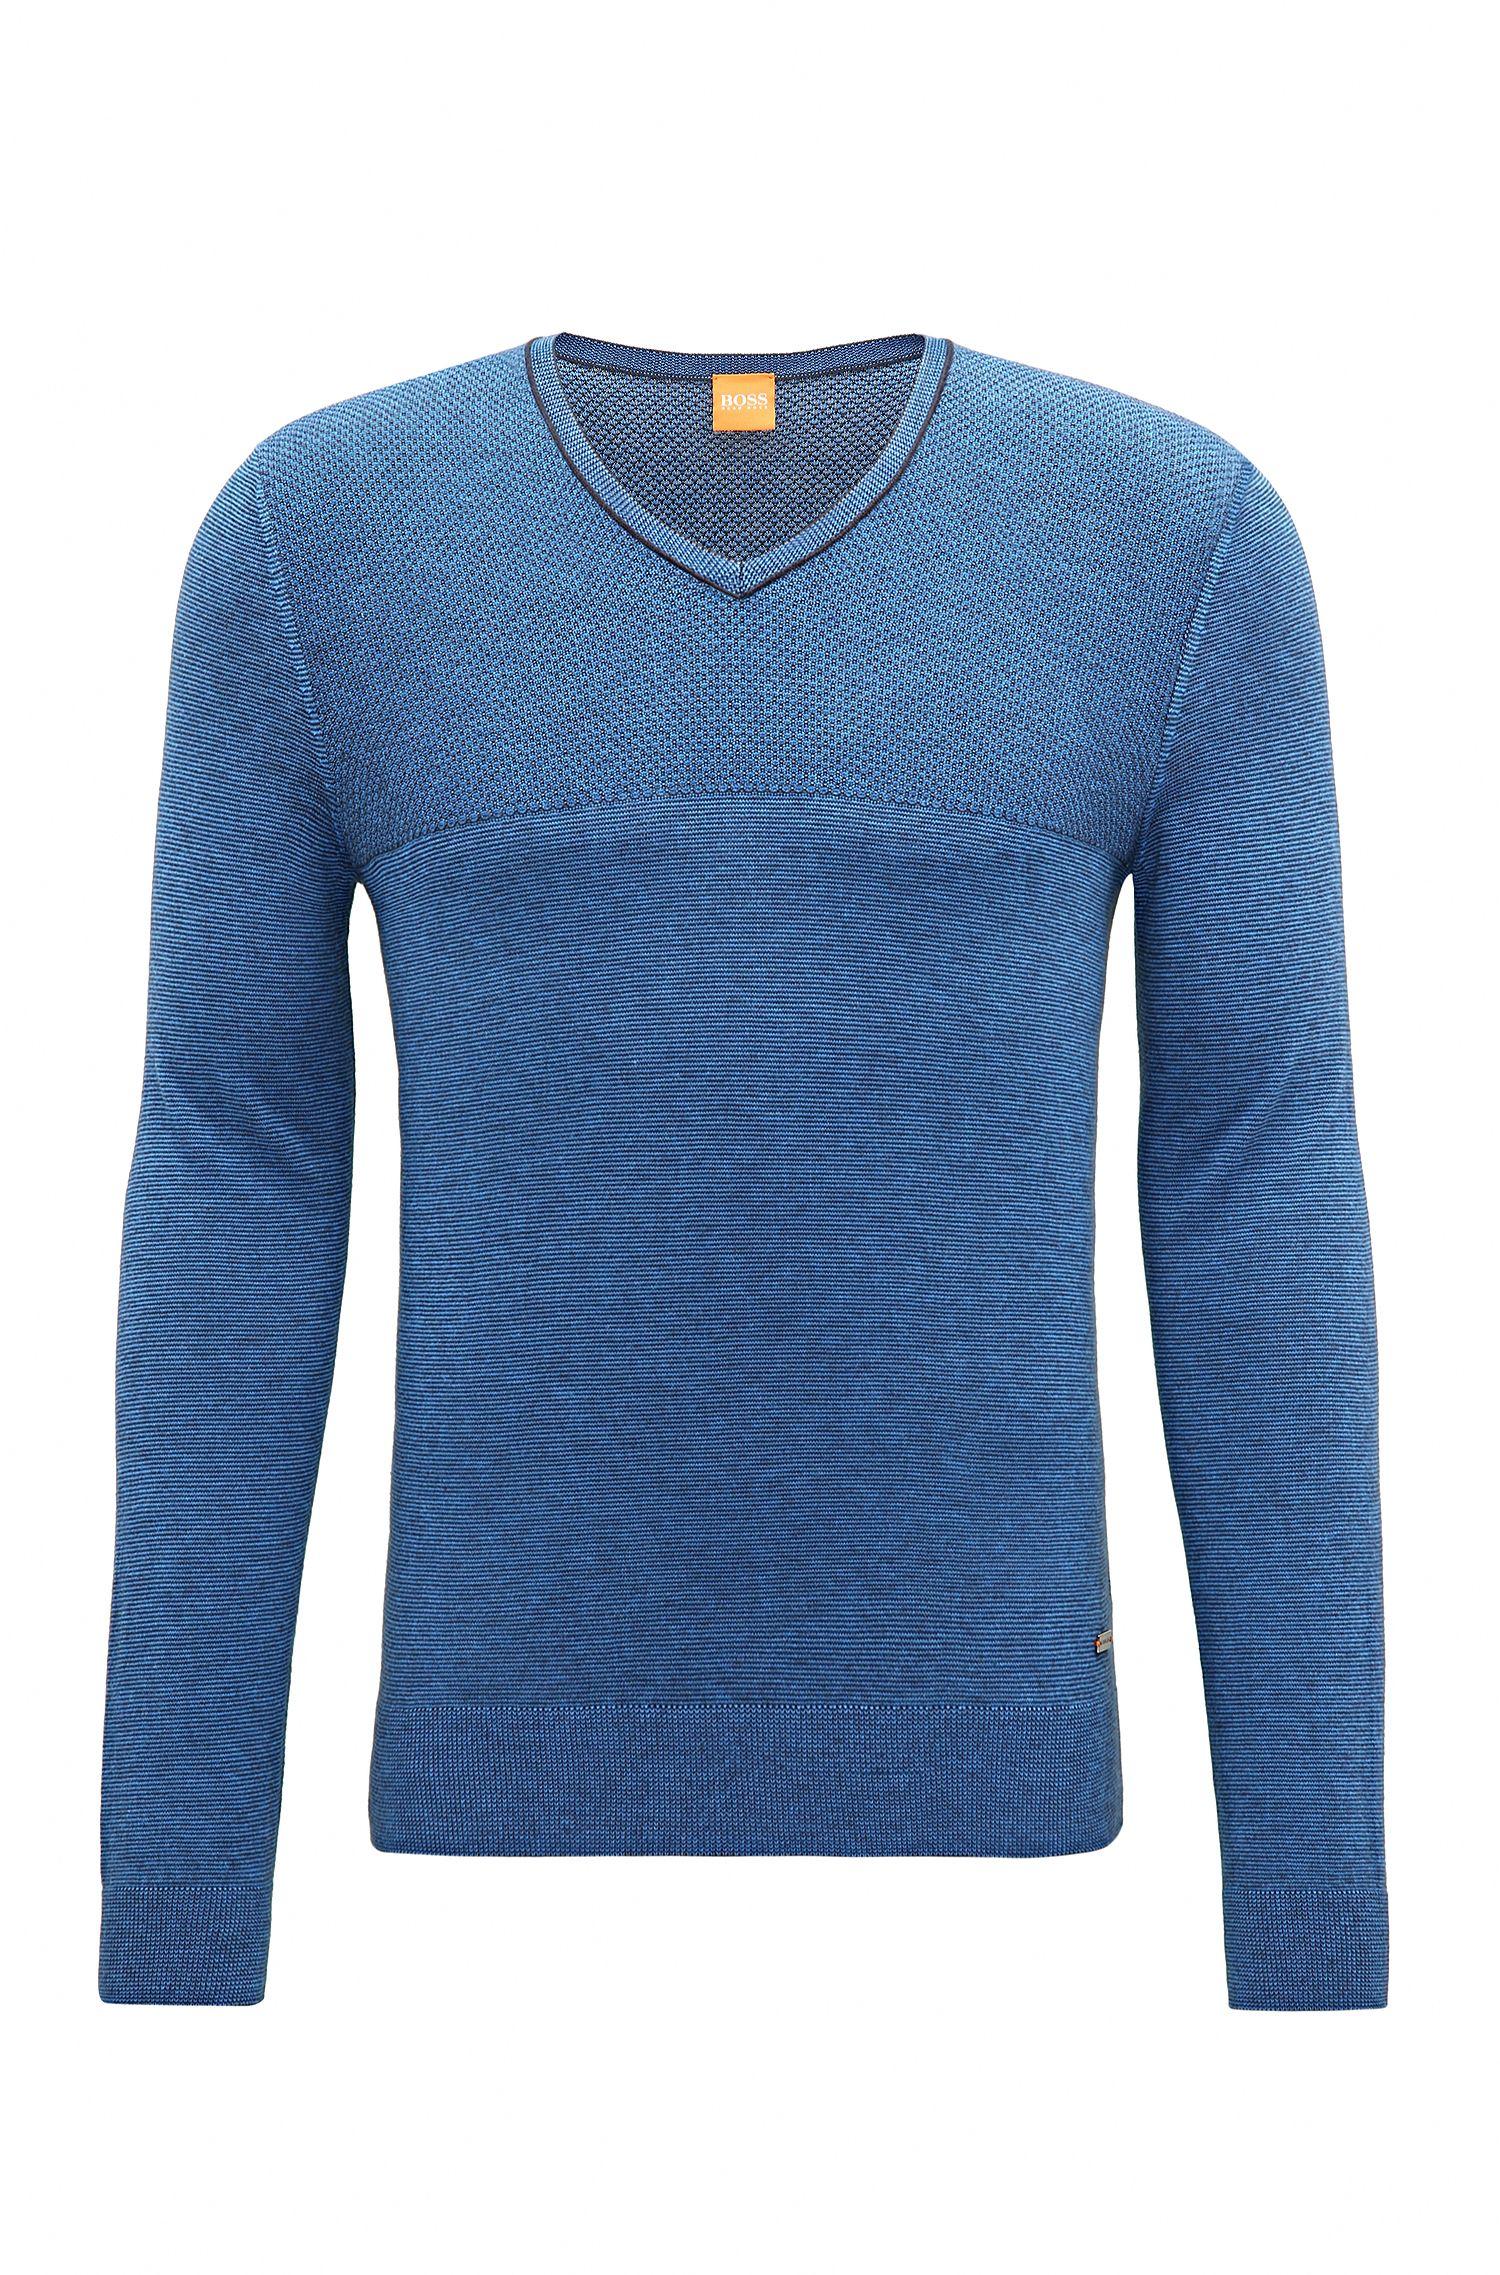 'Kersent' | V-Neck Long Sleeve Cotton Blend Sweater